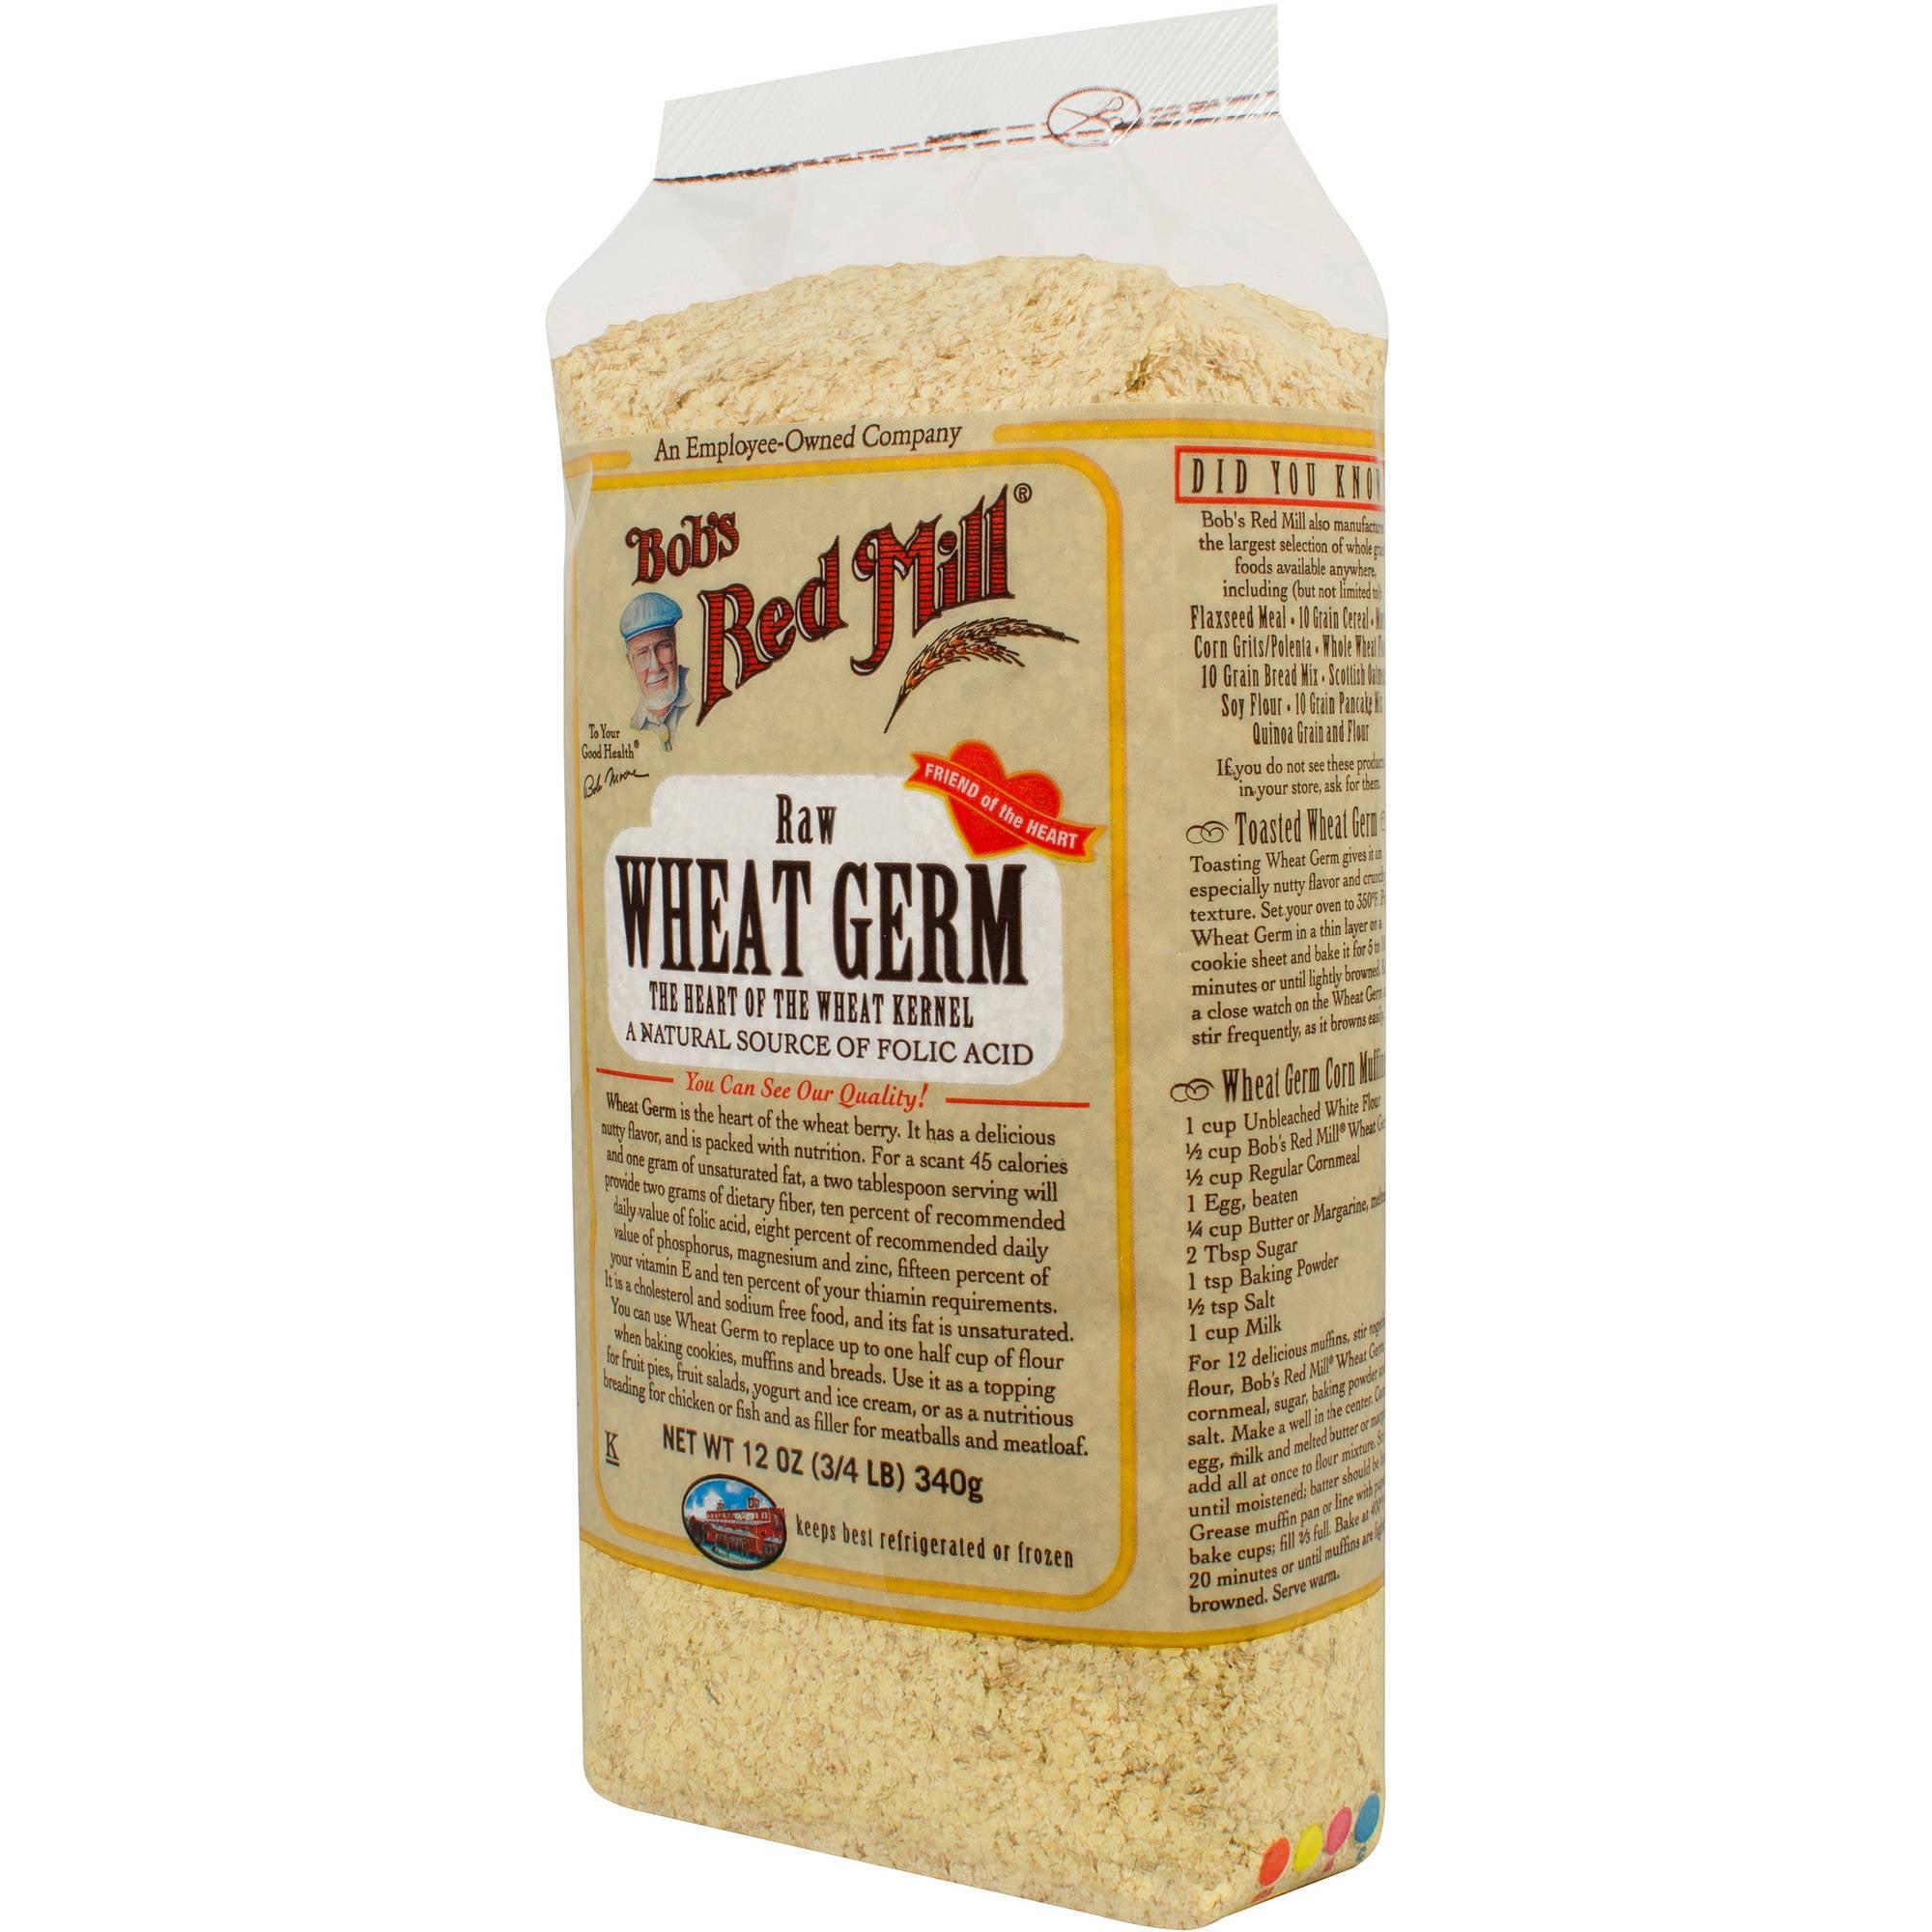 Wheat Germ Free Foods